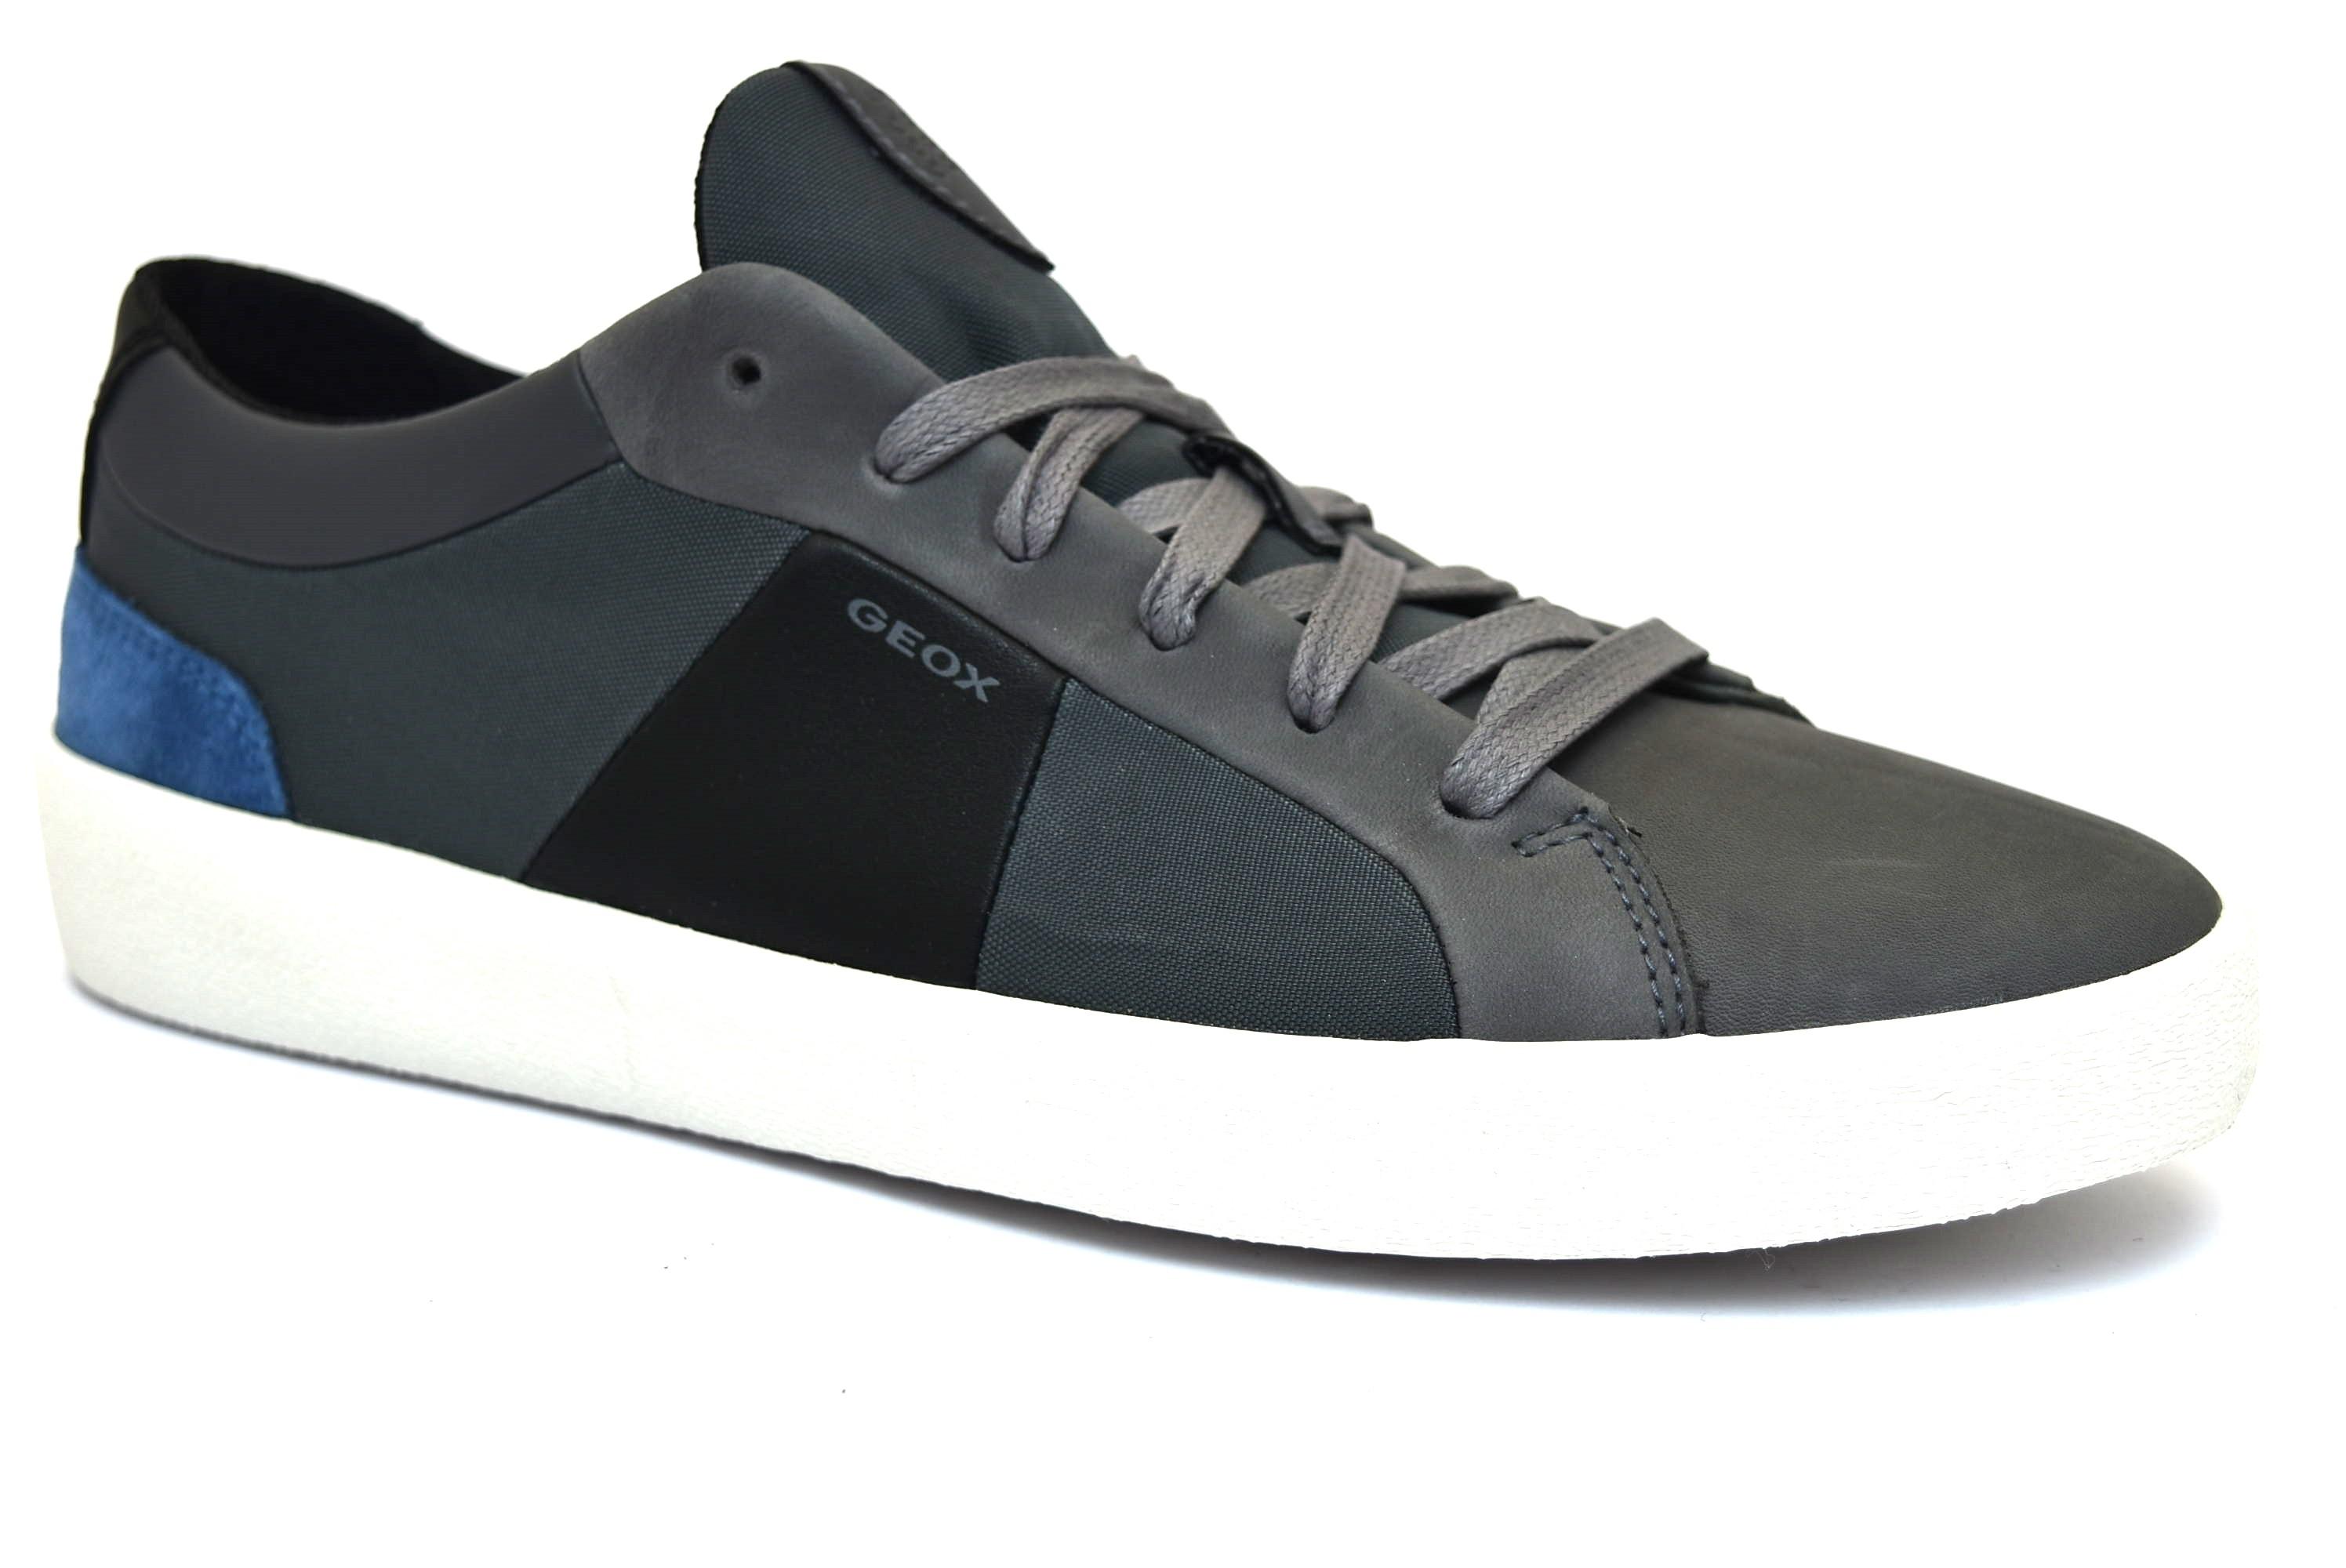 cee12d82b9aef GEOX U926HB 04311 C9147 WARLEY GRIGIO scarpe sneakers uomo primavera estate  vera pelle camoscio